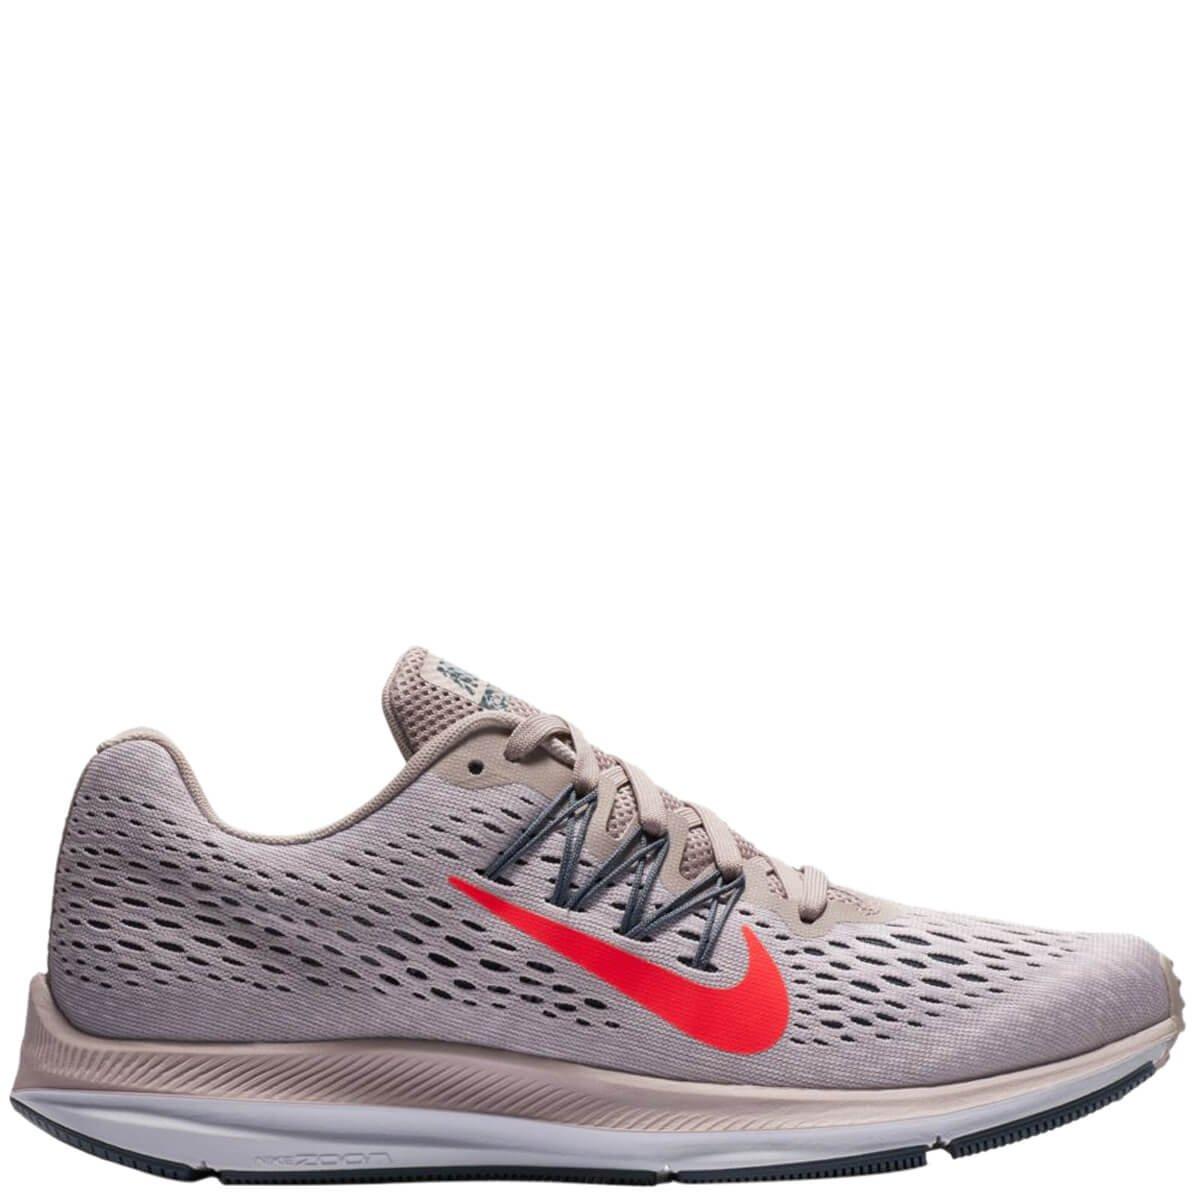 de604f0ce97 Bizz Store - Tênis Feminino Nike Zoom Winflo 5